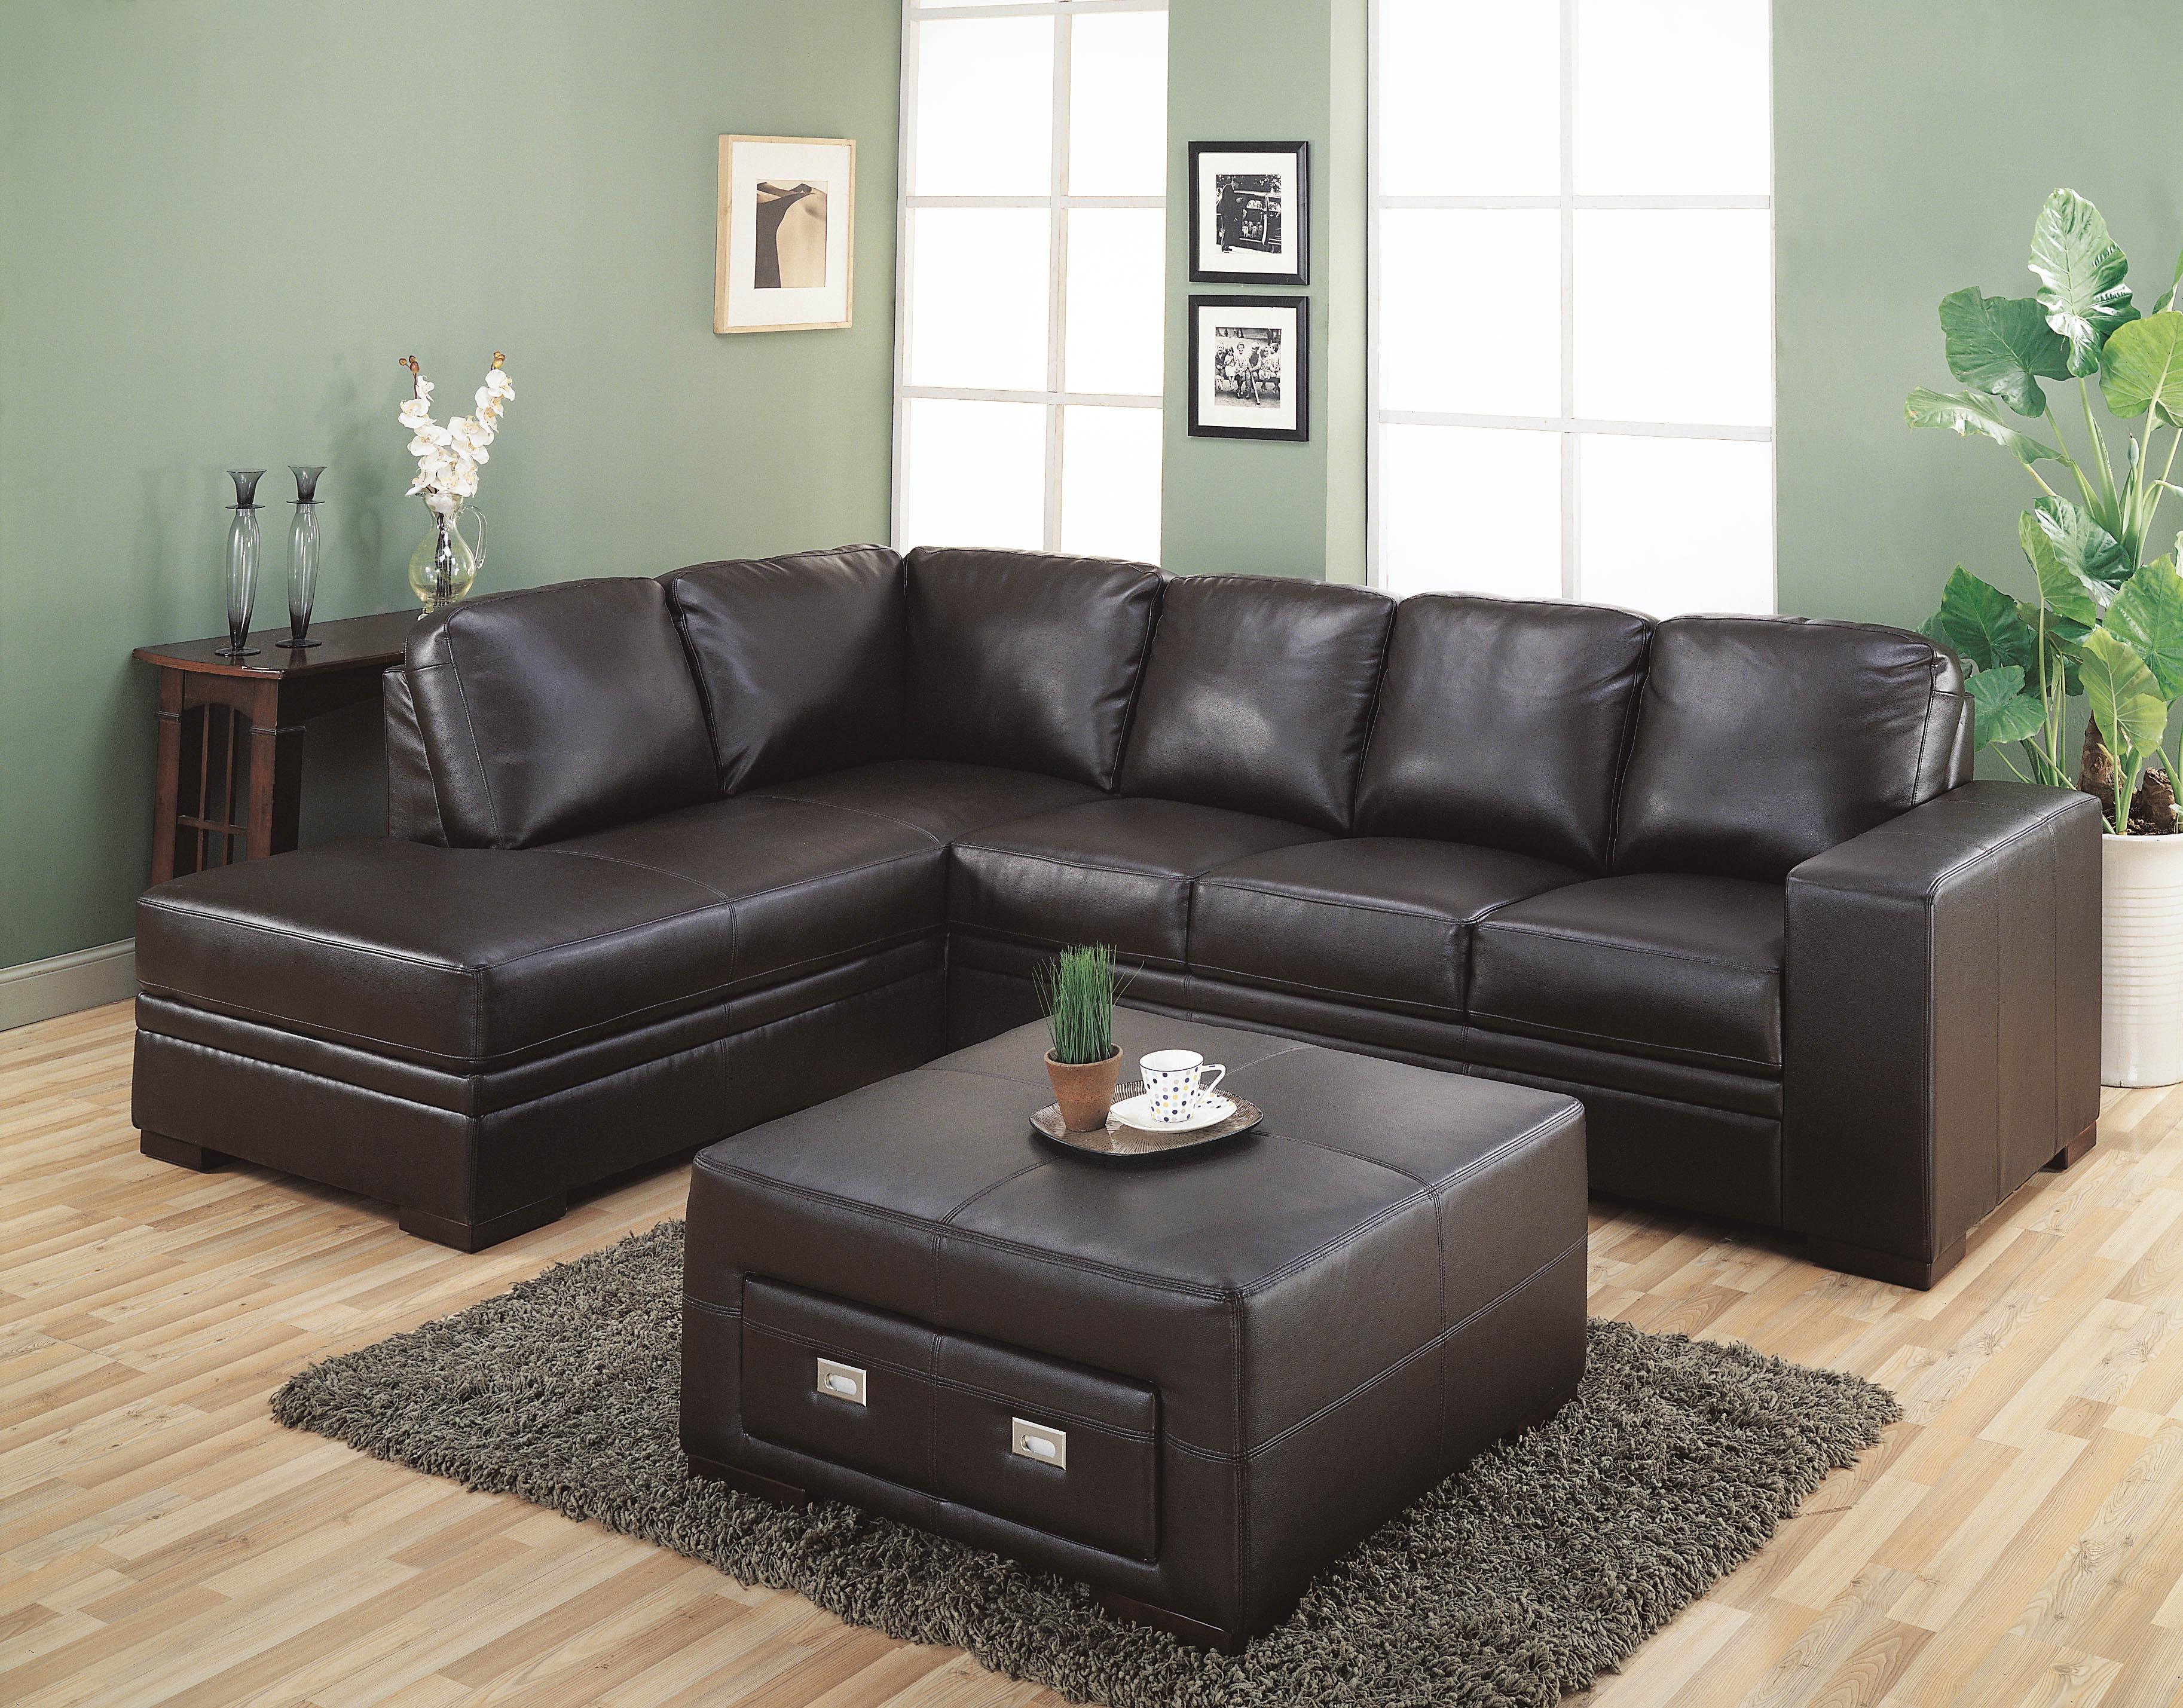 Berkline Leather Sofa Pertaining To Berkline Sectional Sofa (#3 of 12)